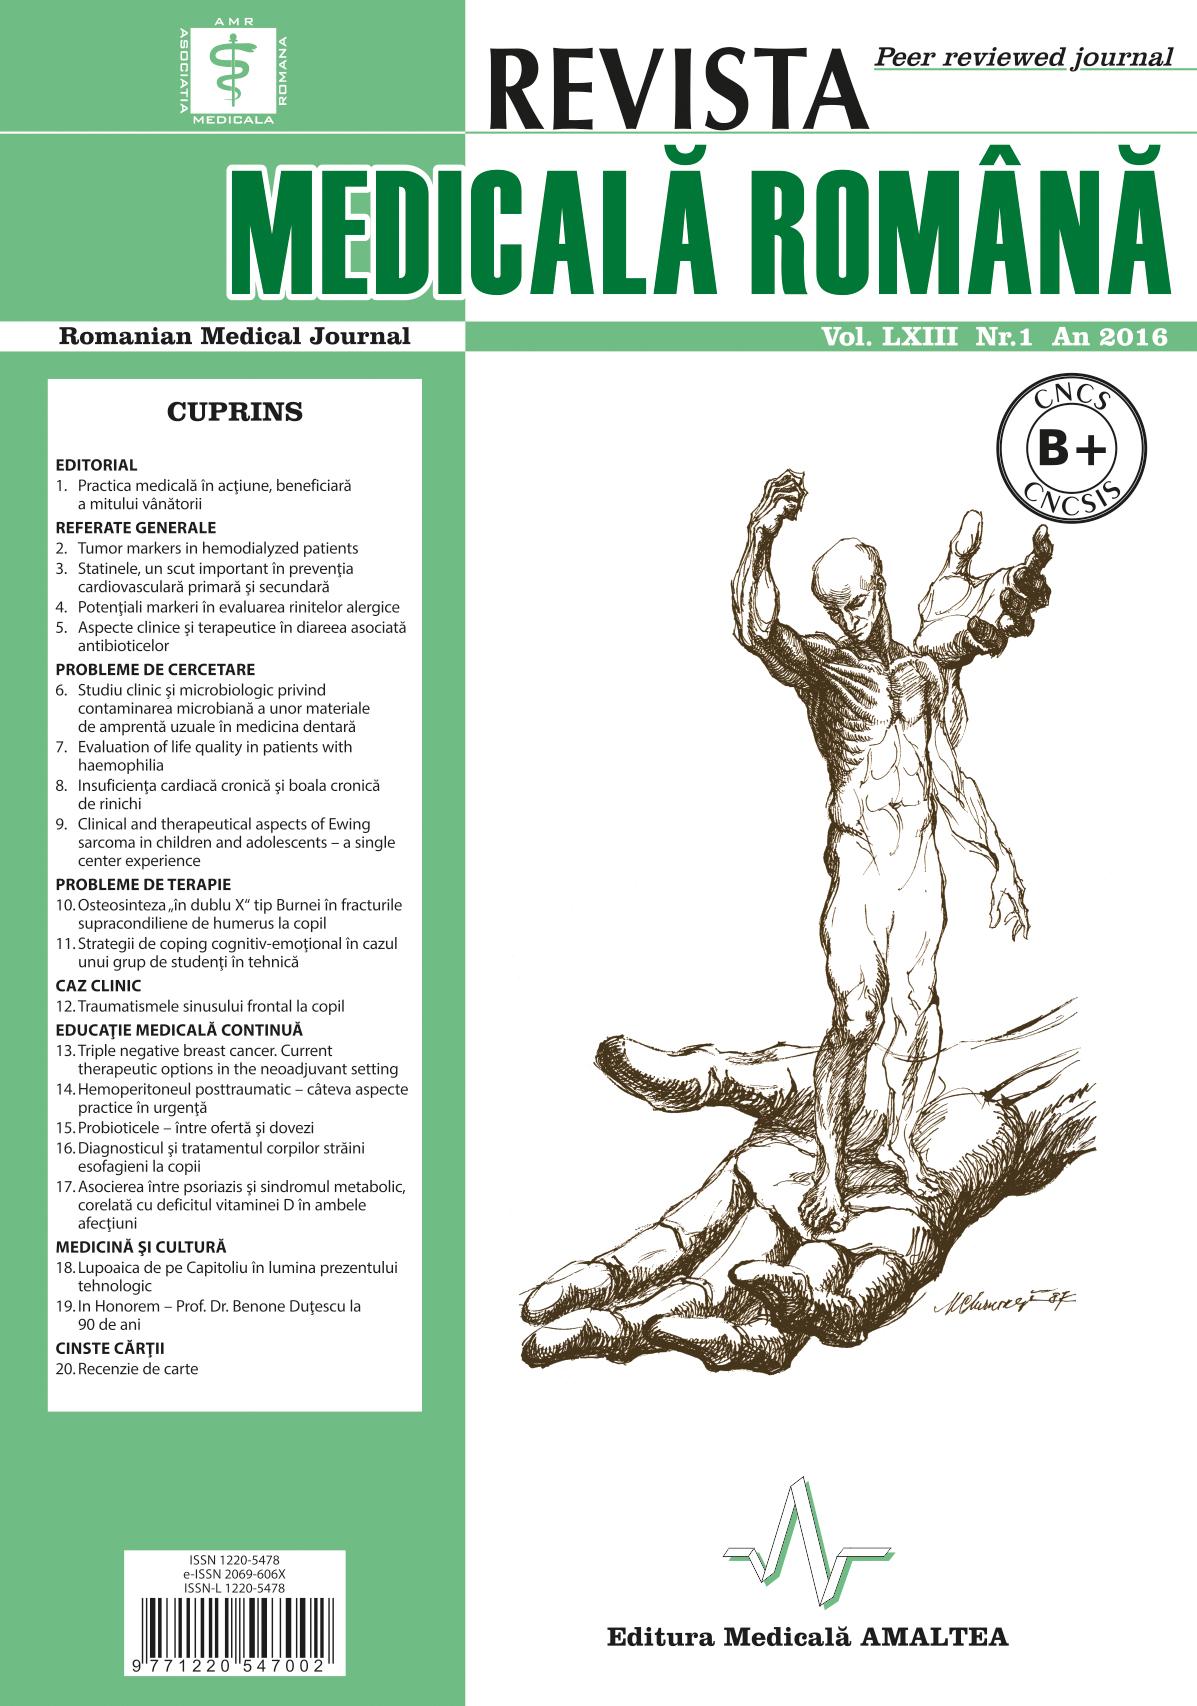 REVISTA MEDICALA ROMANA - Romanian Medical Journal, Vol. LXIII, No. 1, Year 2016